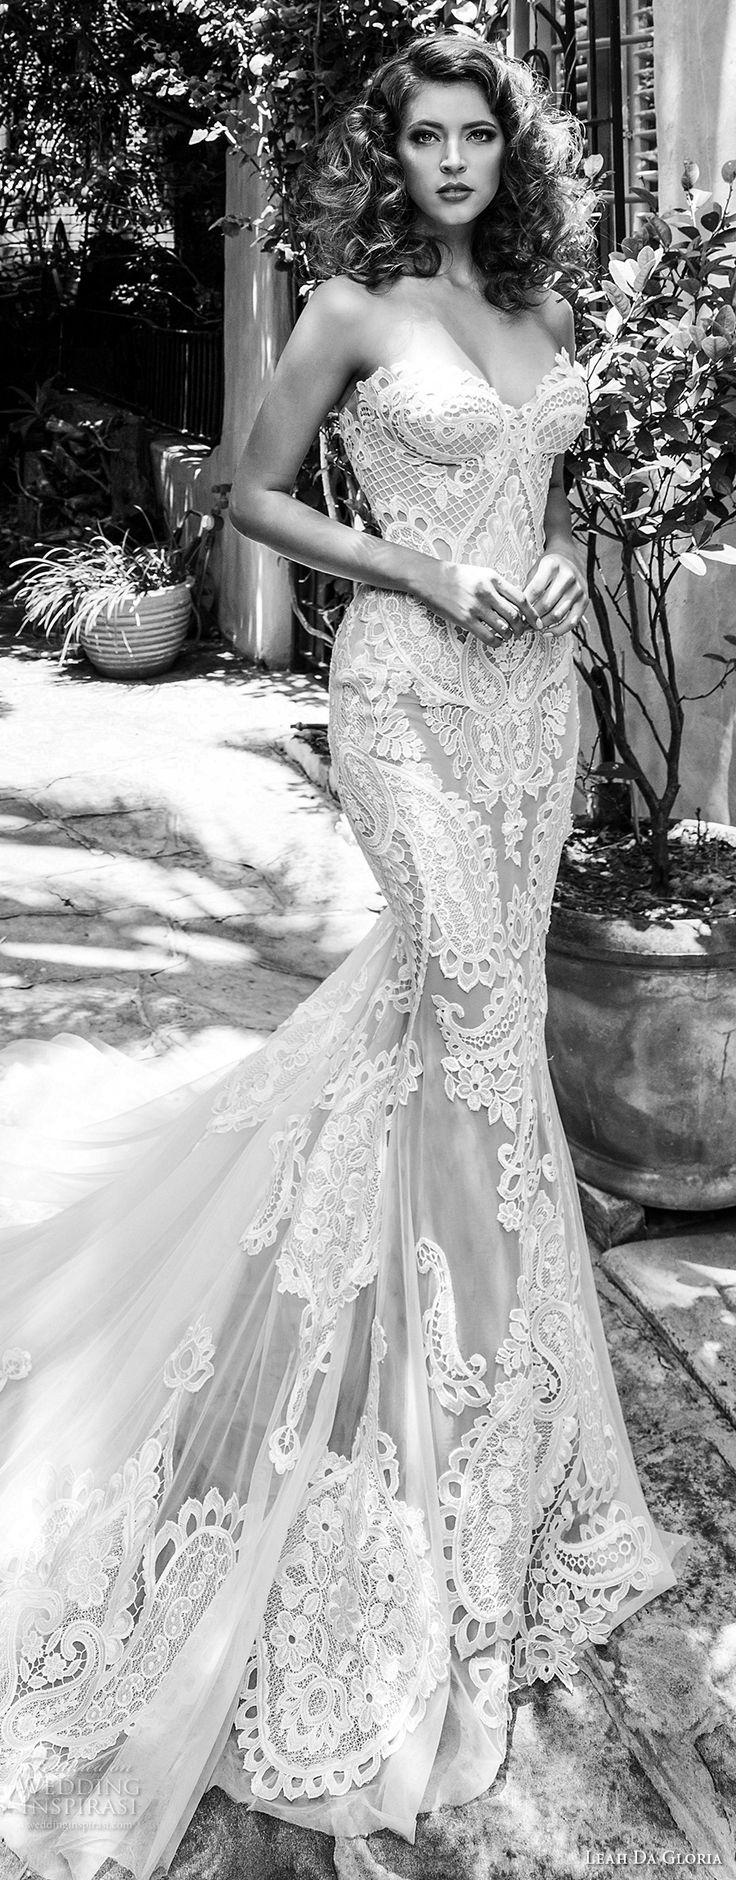 best Wedding Stuff images on Pinterest  Weddings Wedding ideas